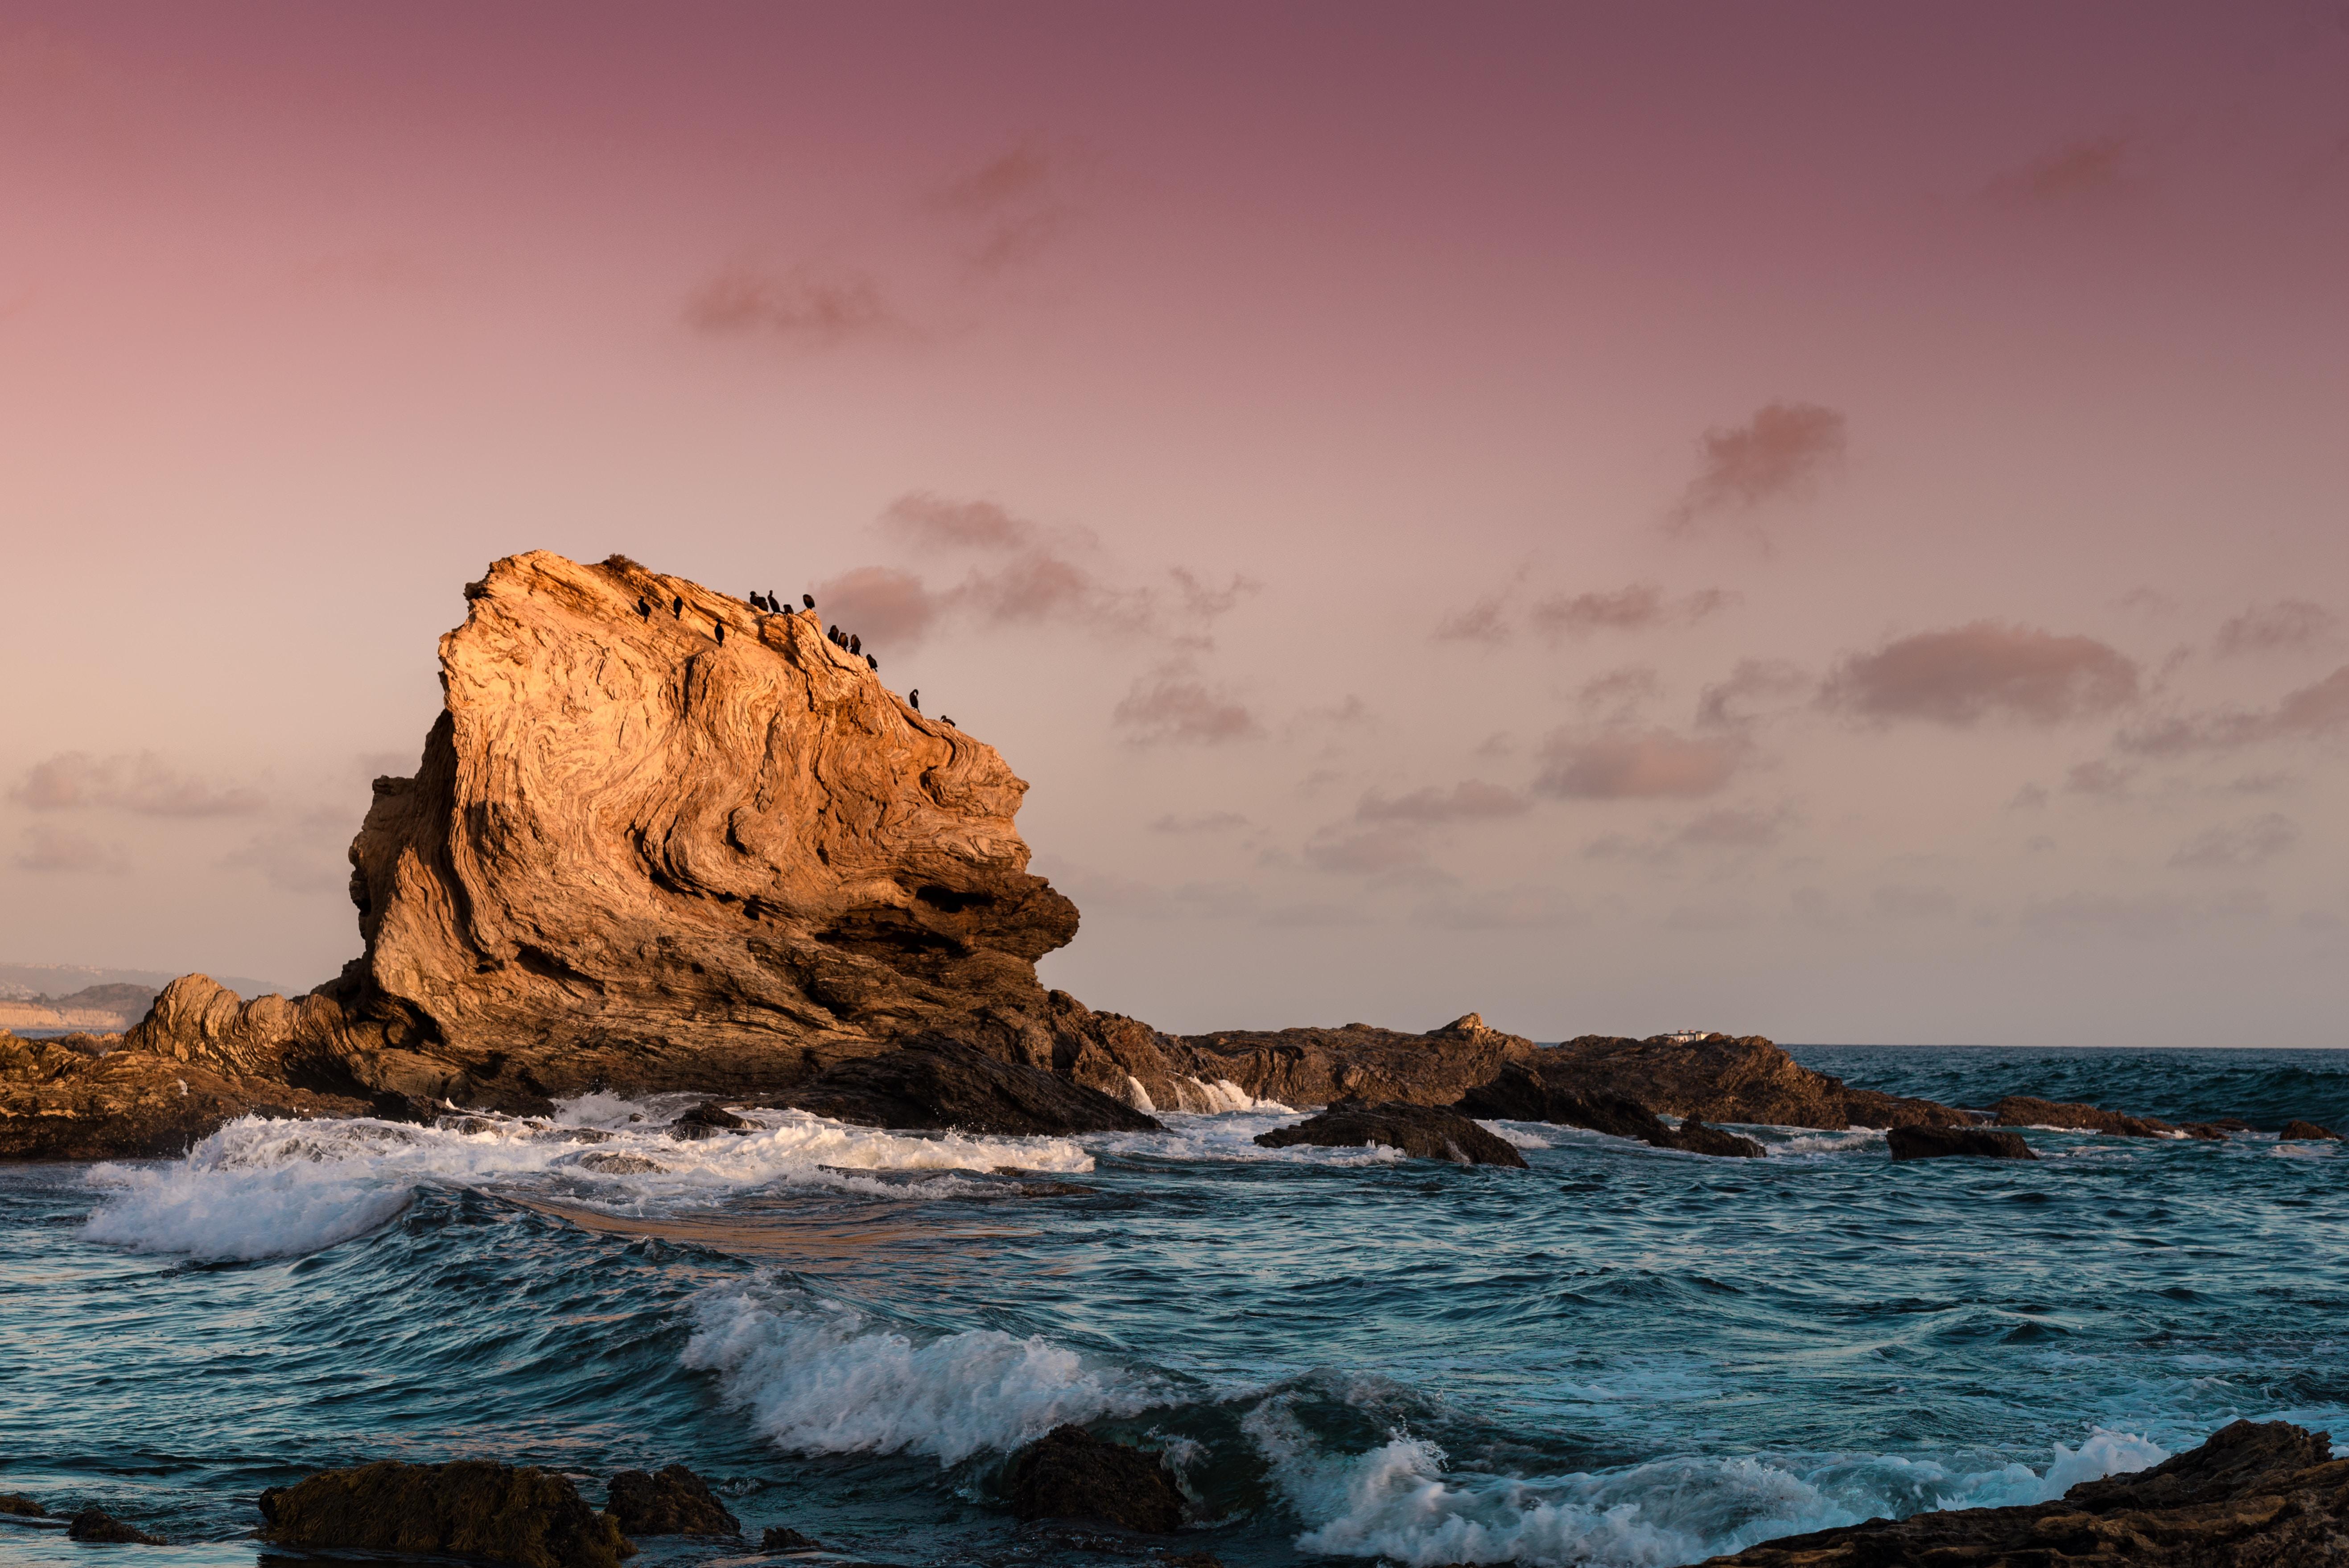 sea waves and boulder